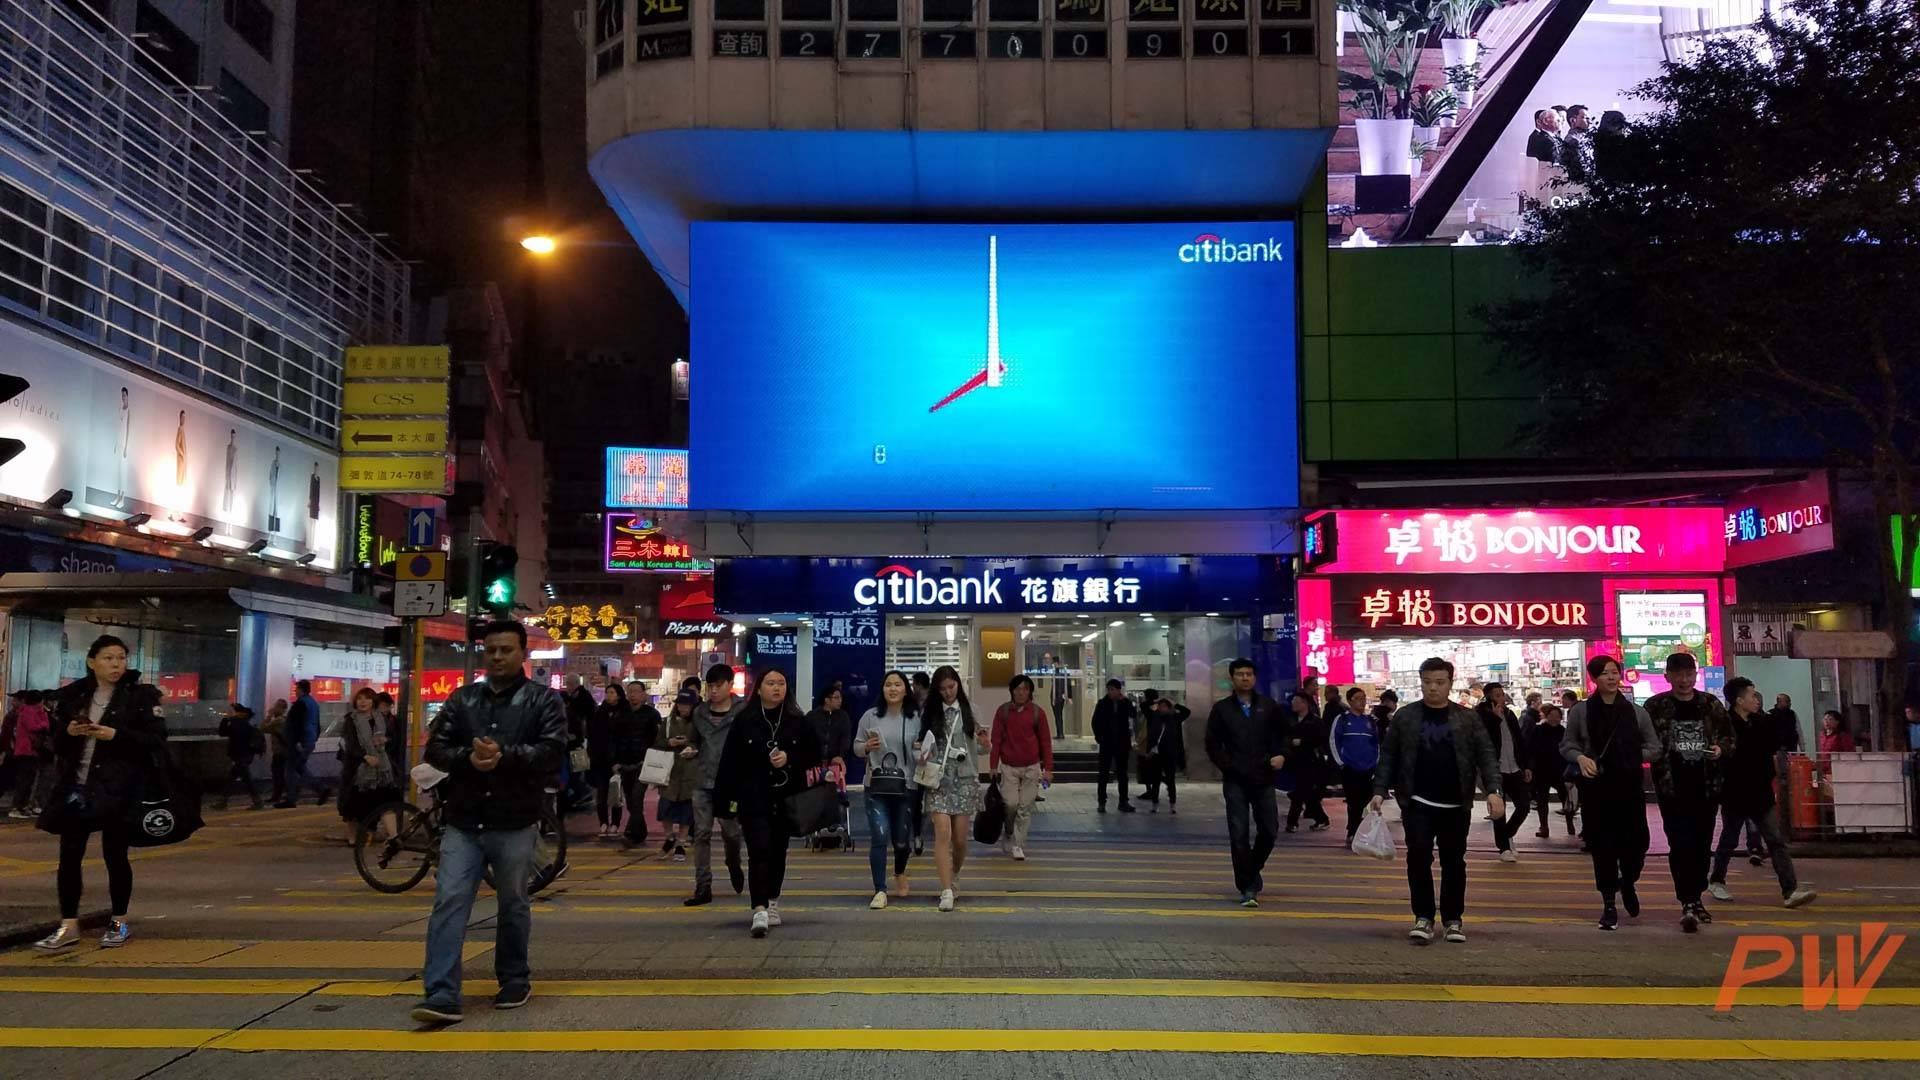 Galaxy S7 edge Camera Sample PingWest Photo By Hao ying